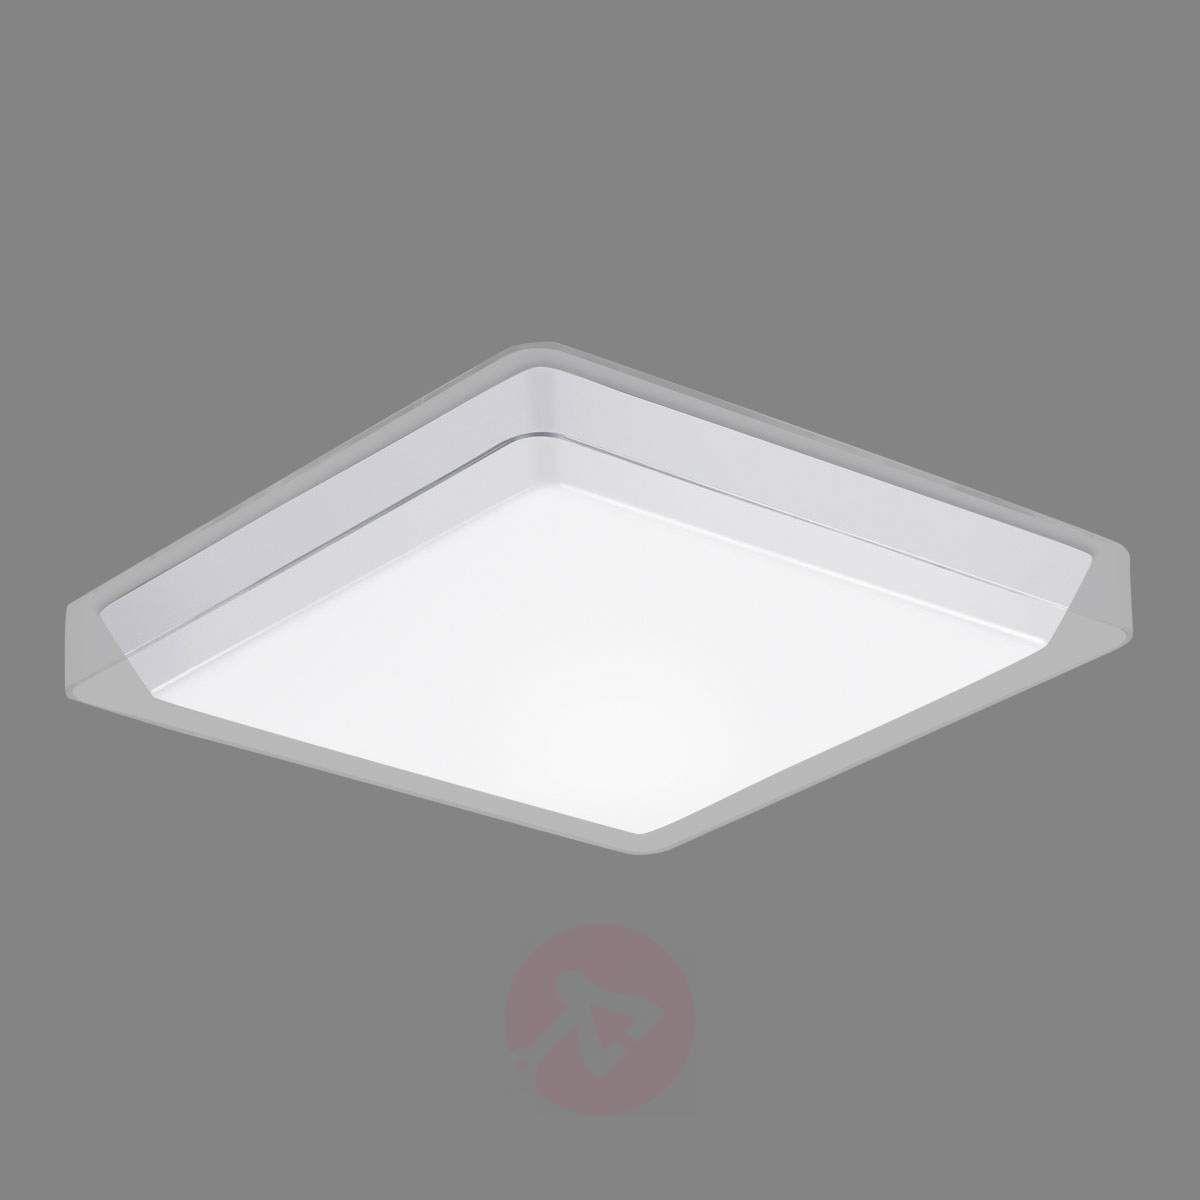 Lampa sufitowa LED KL375, ciepła biel | Lampa sufitowa